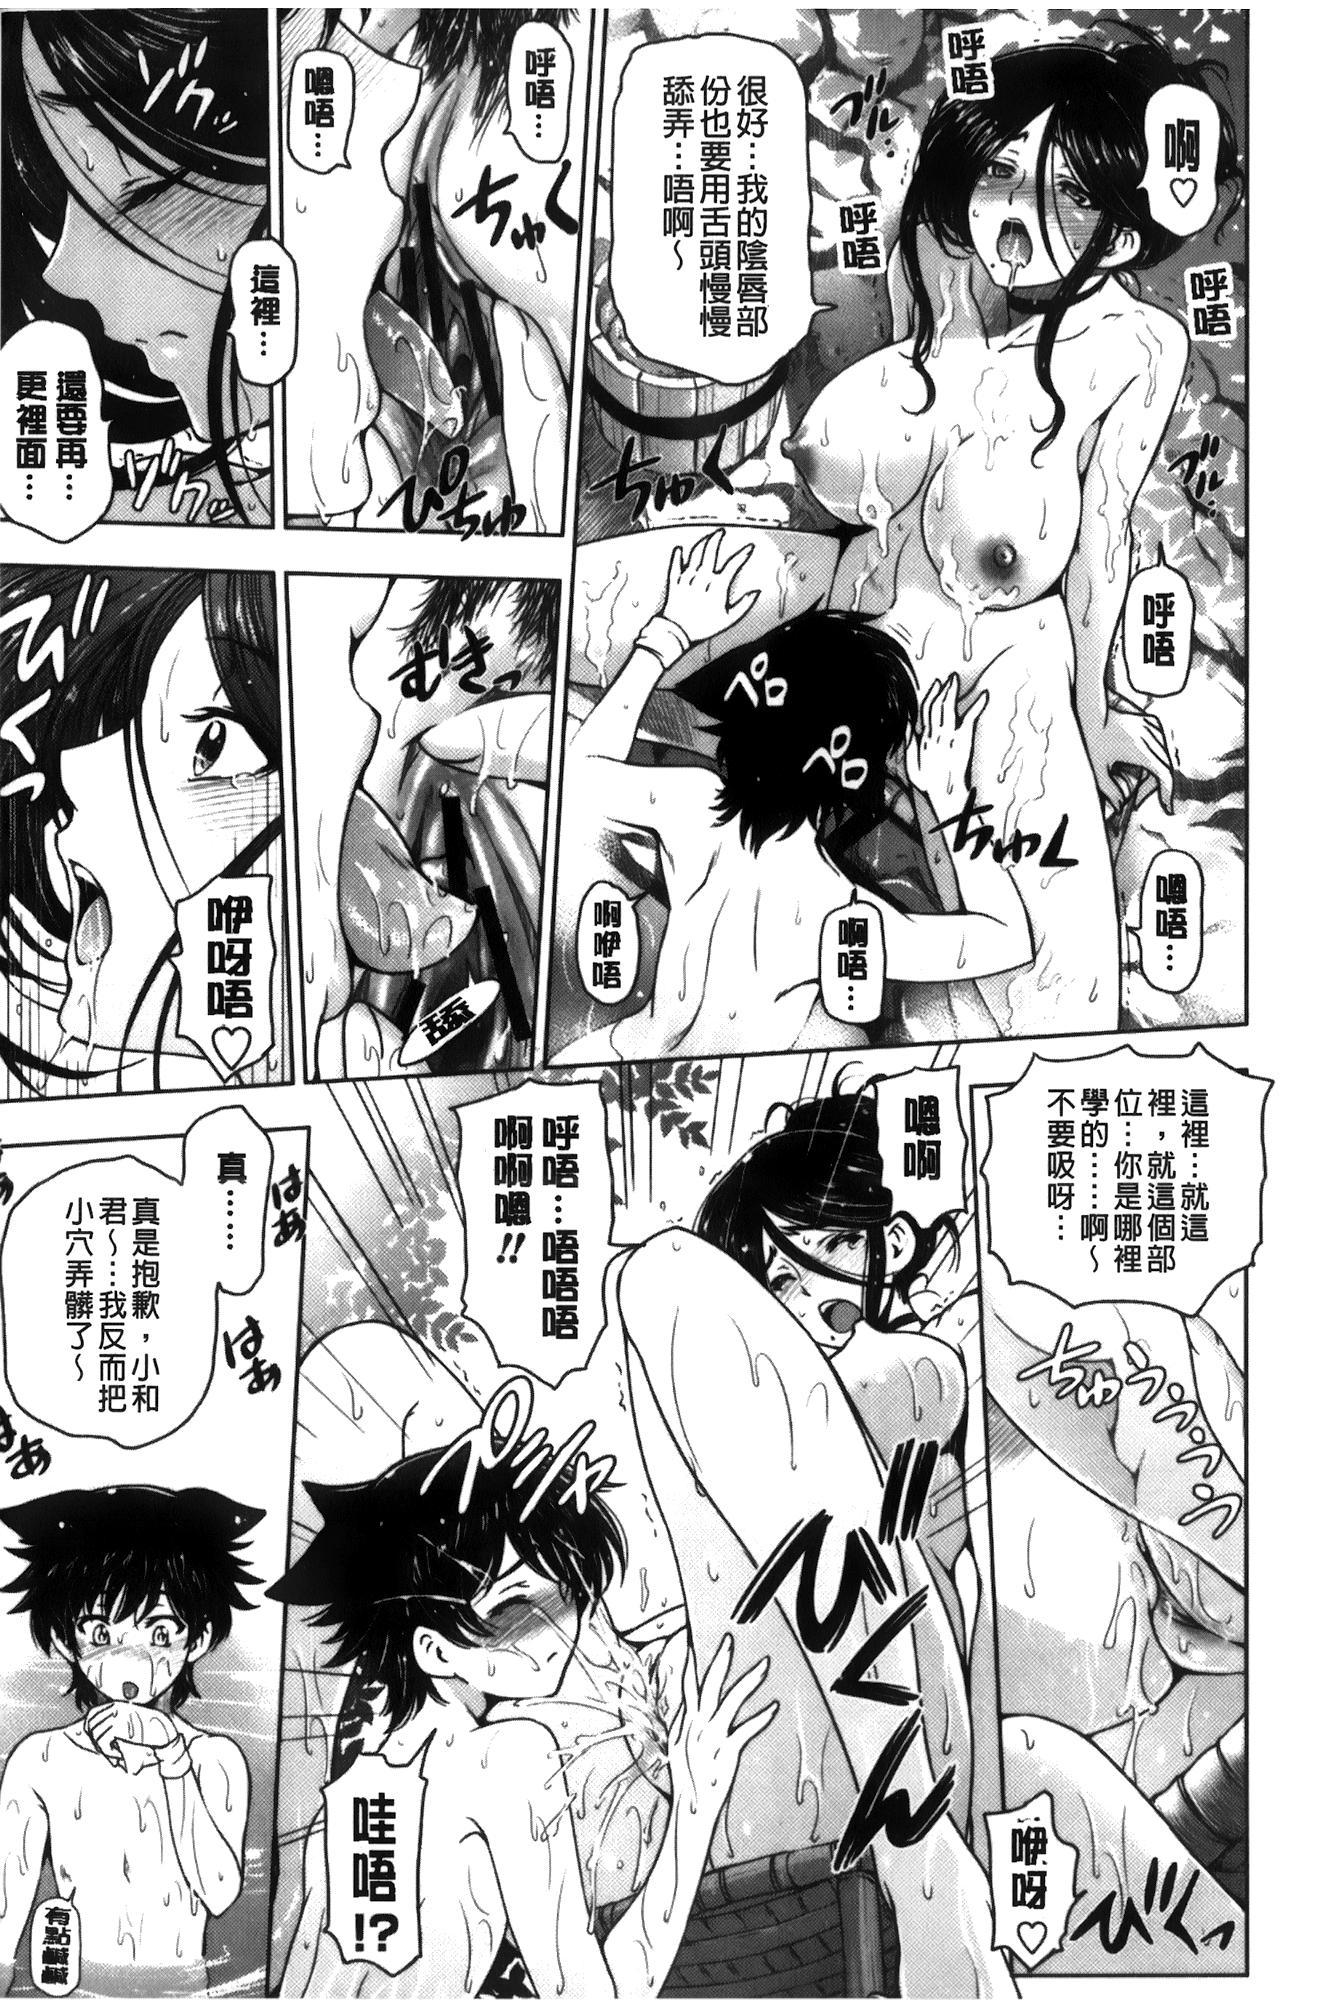 Majo × Shota ~ Genteiban | 魔女X小正太 限定版 141